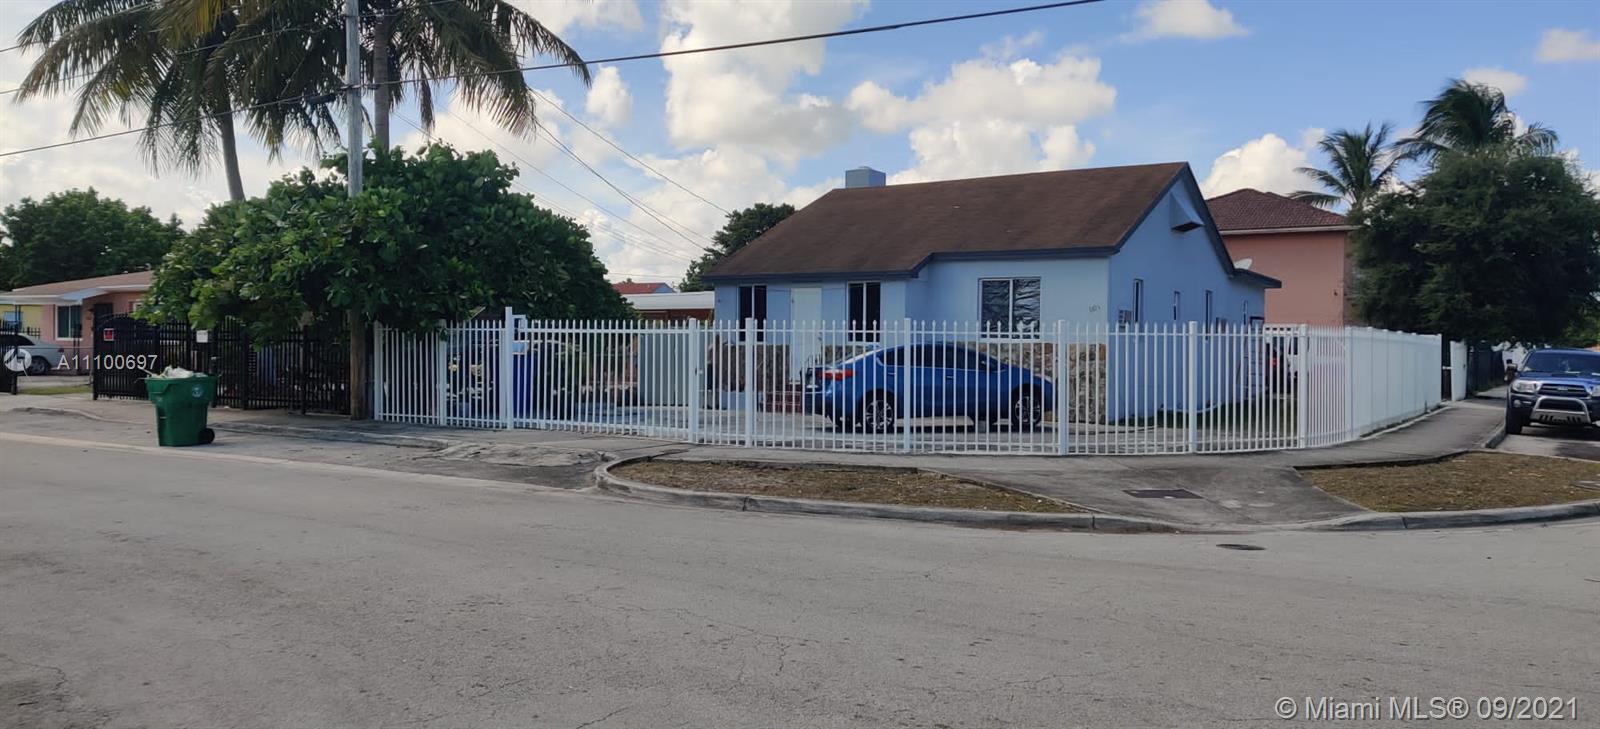 Single Family Home For Sale BON AIRE1,078 Sqft